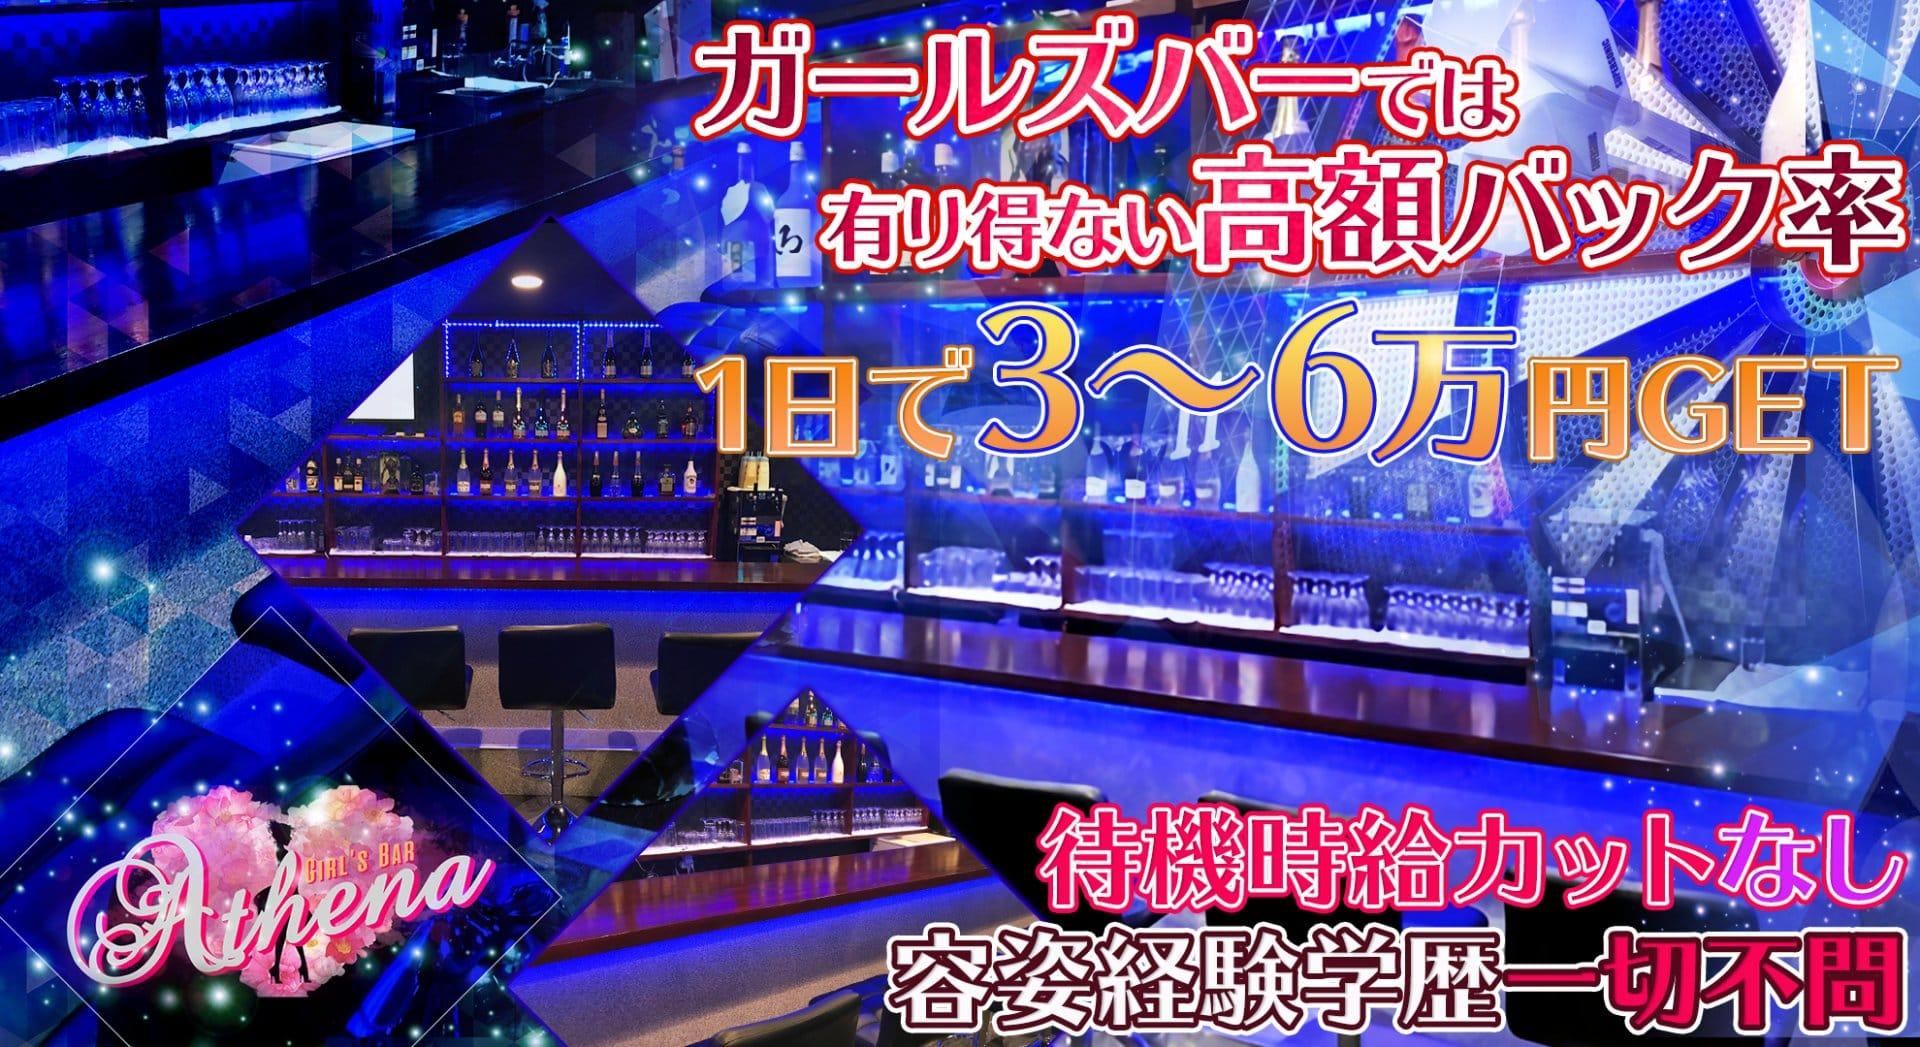 Girl's café&bar Athena(アティーナ) 草加ガールズバー TOP画像